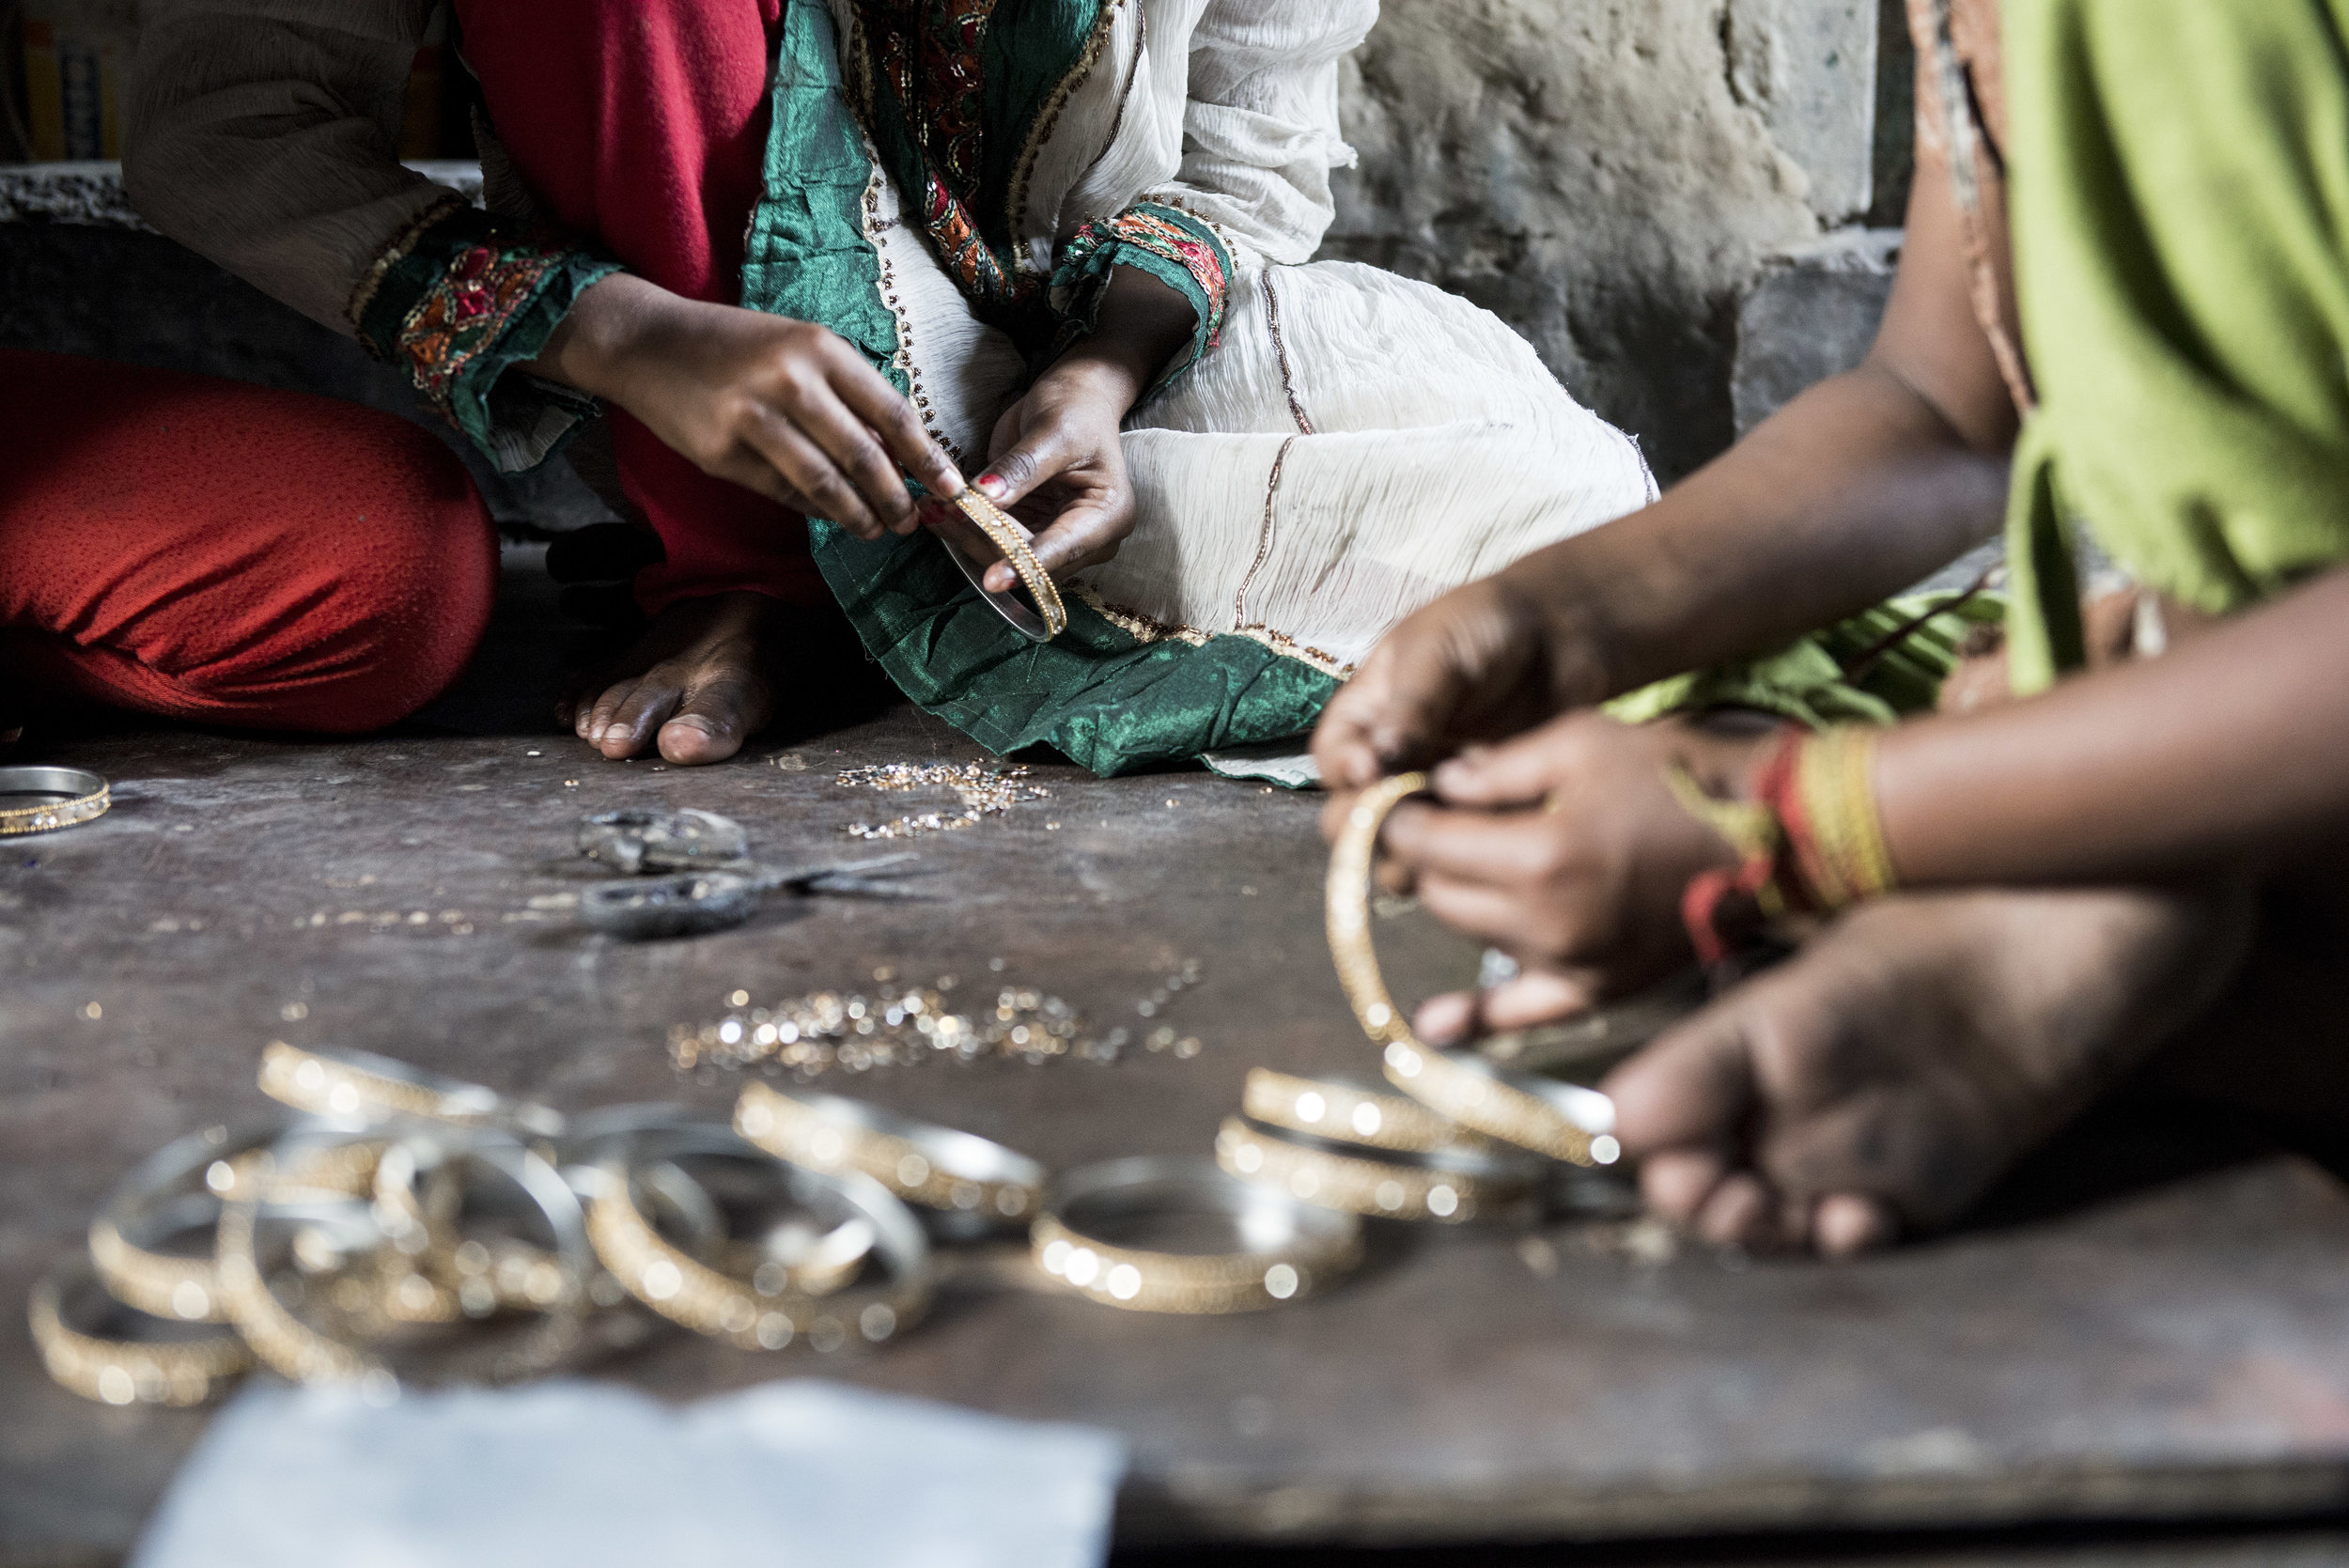 Child Protection program in bangle making village. Kolkata, India. 2015.